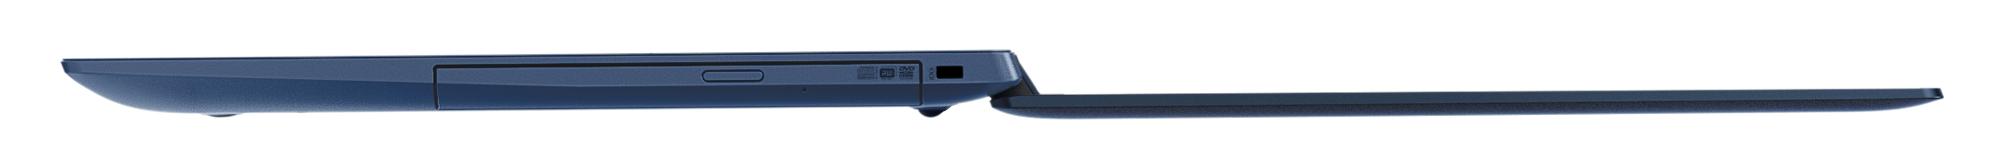 Фото  Ноутбук Lenovo ideapad 330-15 Mid Night Blue (81DC00ABRA)